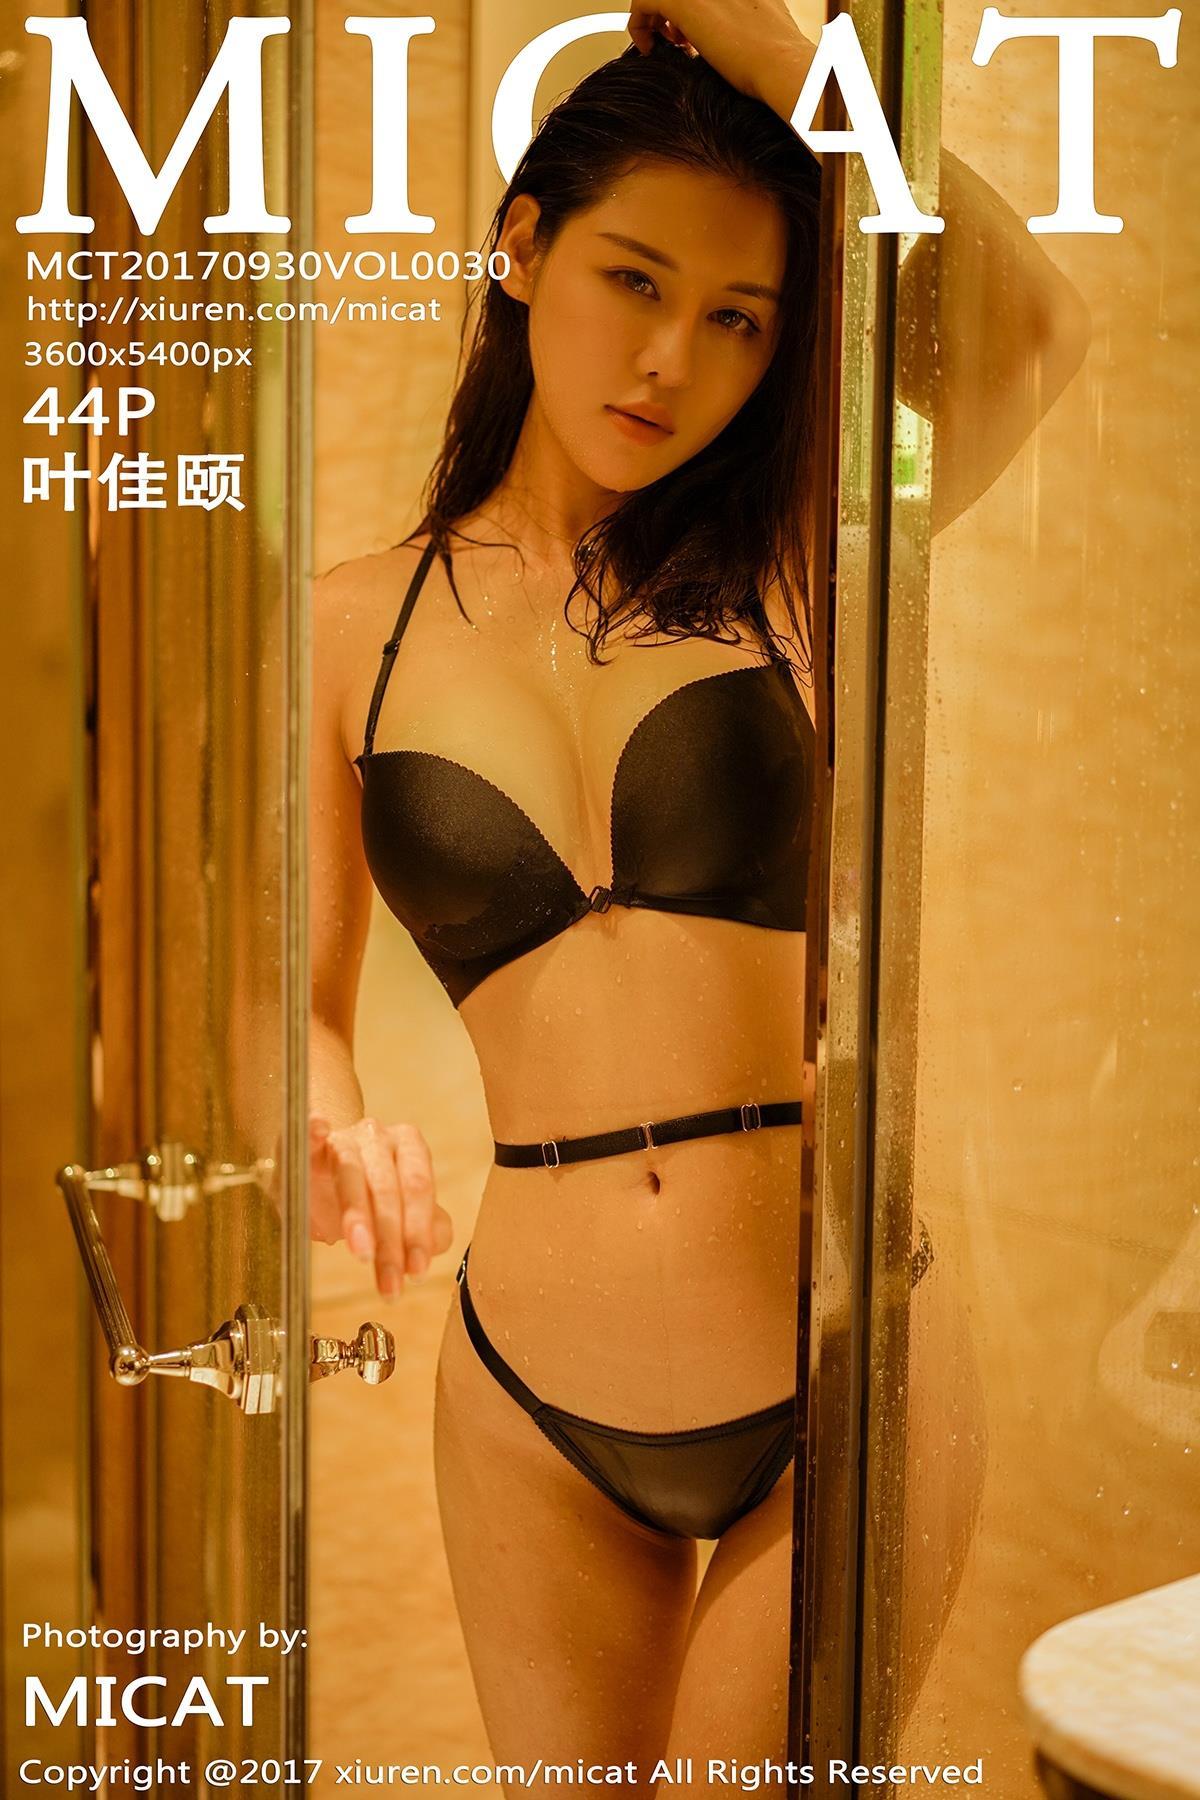 [MICAT猫萌榜]MCT20170830VOL0030 叶佳颐 酒店内粉色连身裙与黑色性感内衣私房写真集